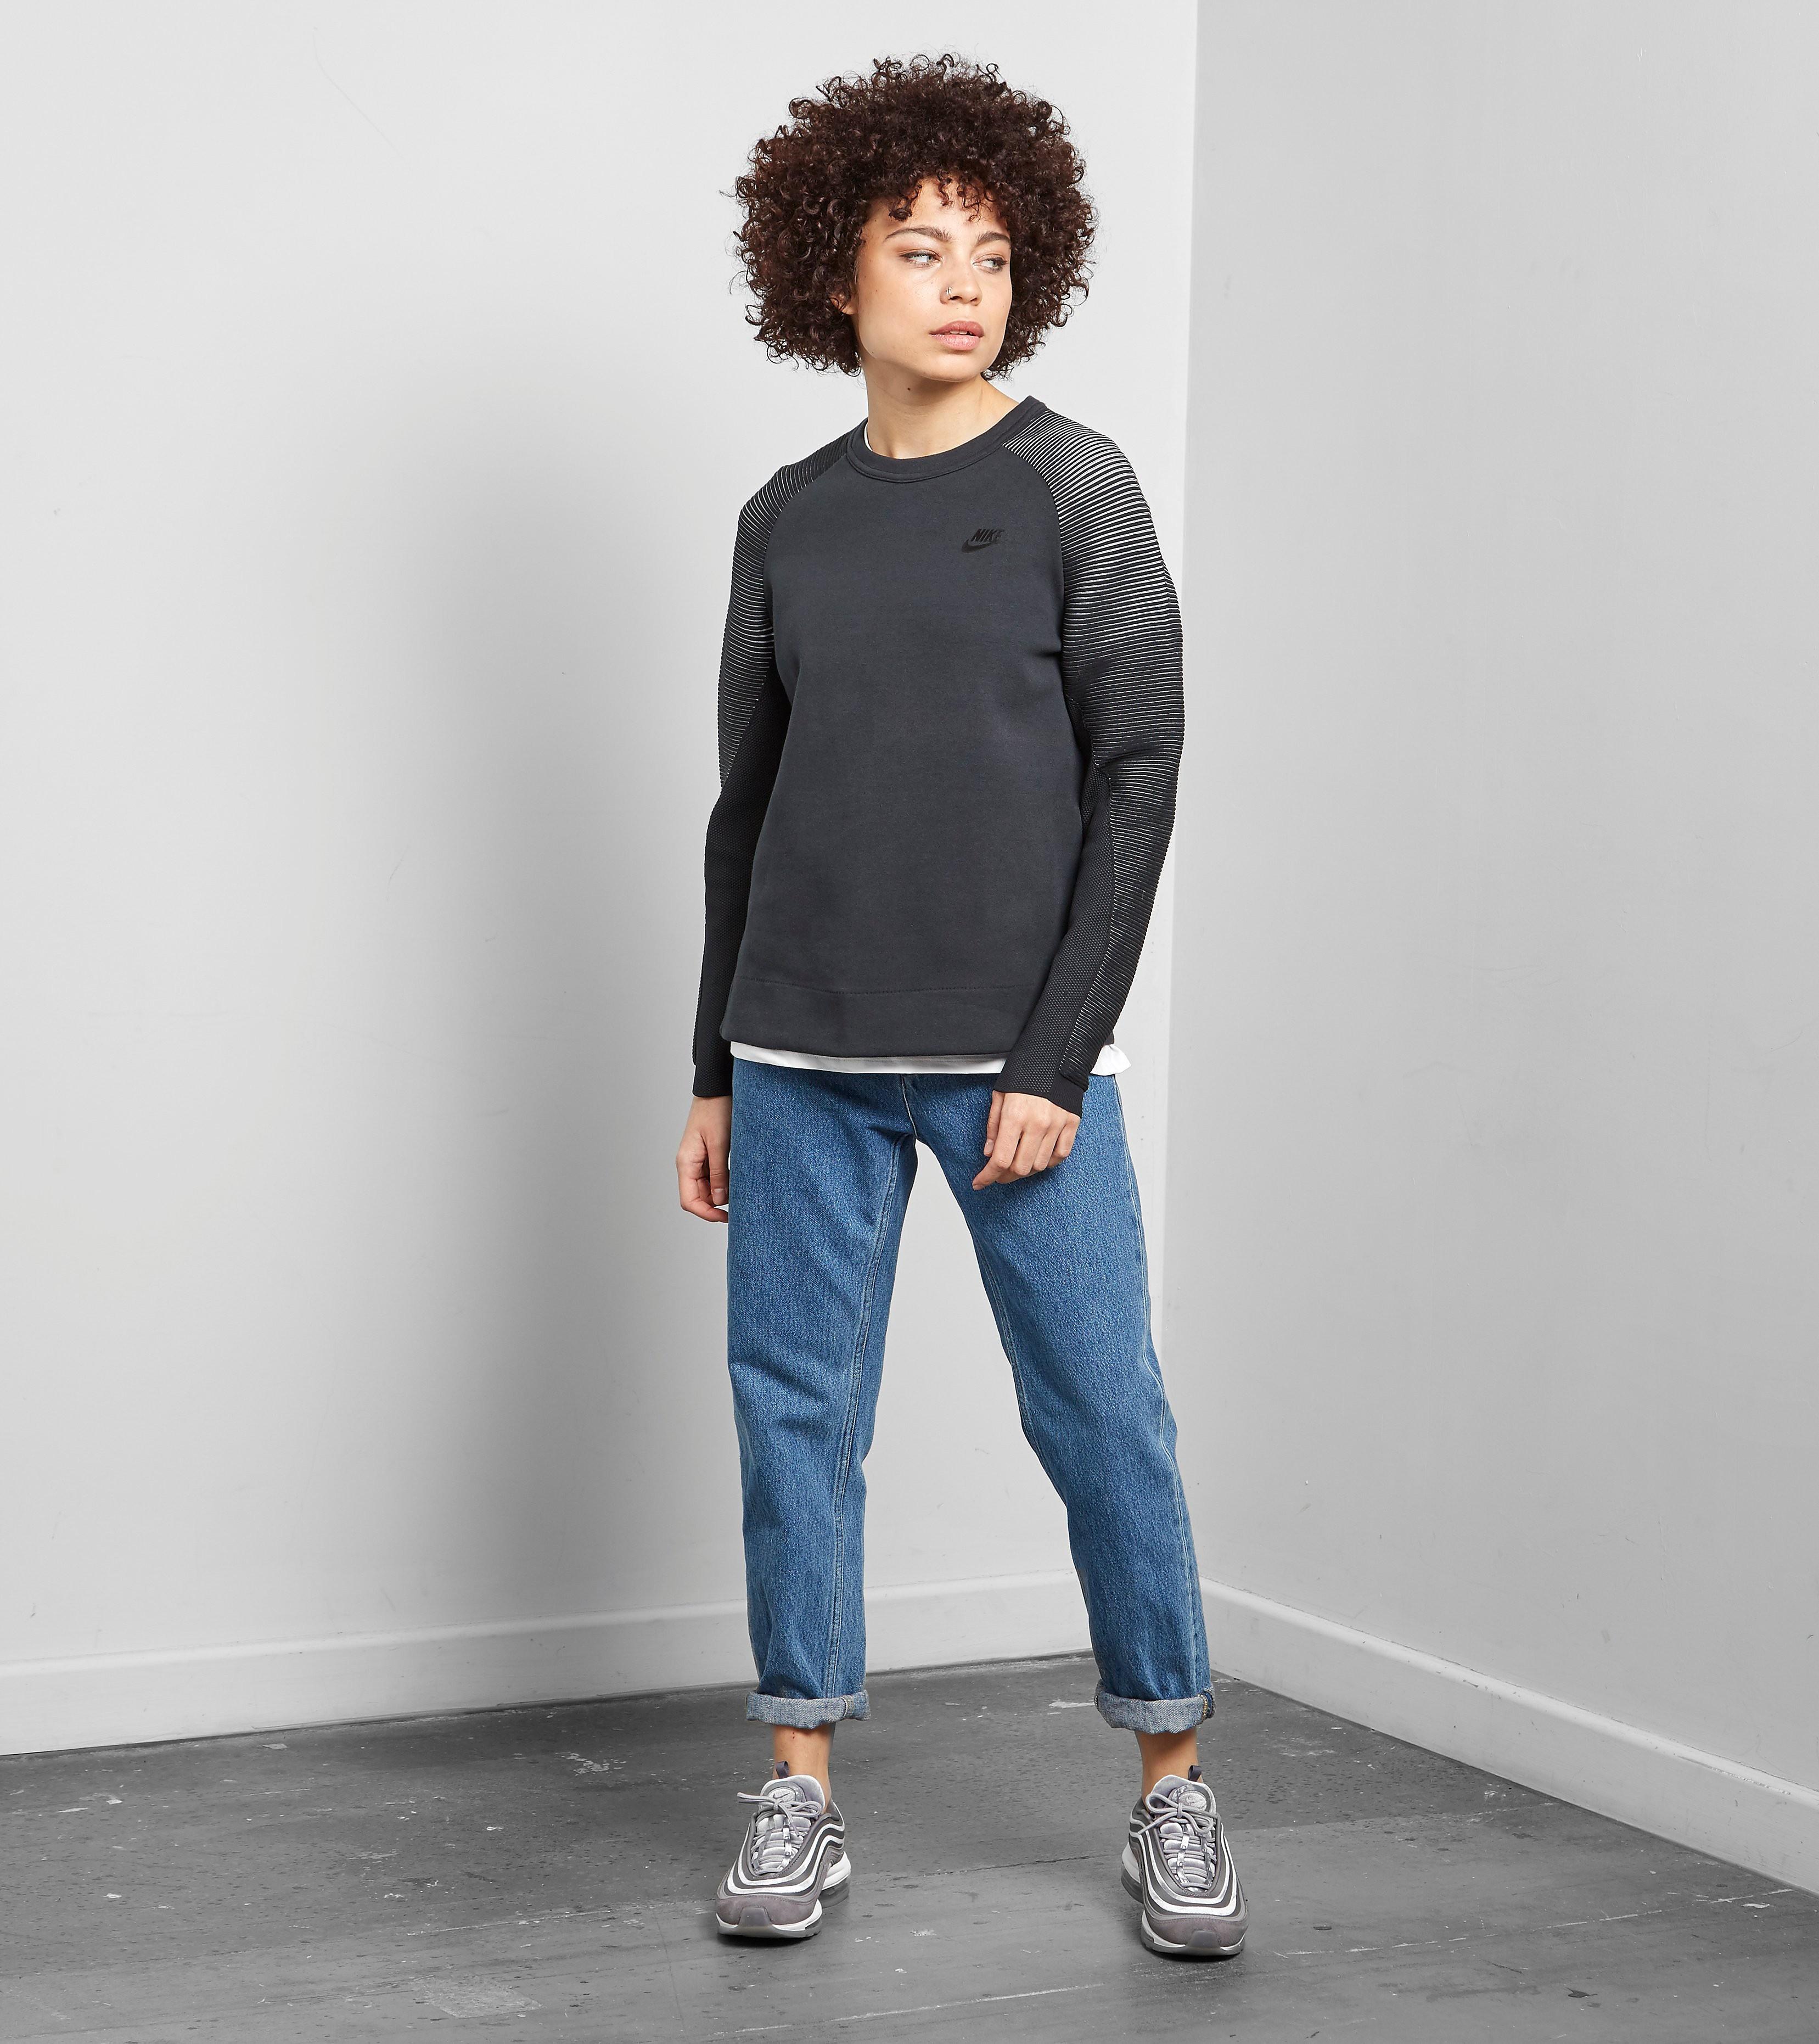 Nike Tech Reveal Crew Sweatshirt